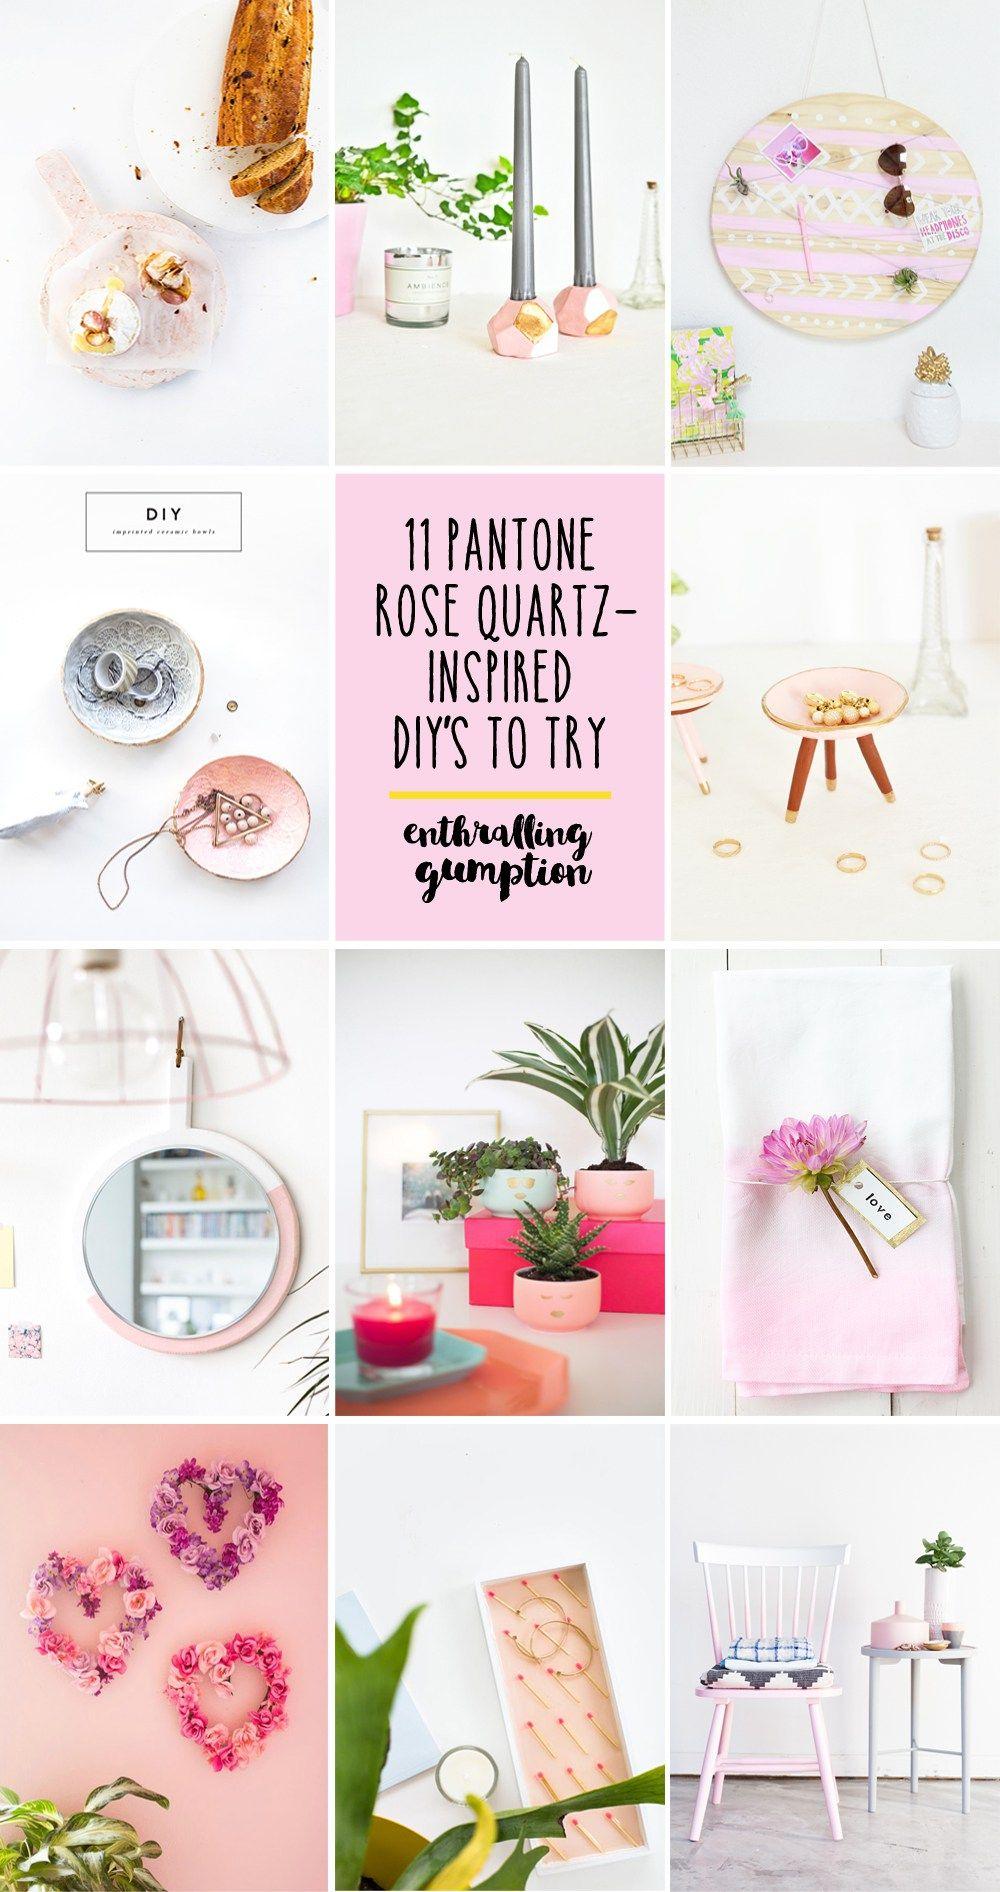 Pantone Rose Quartz-inspired DIY's to try